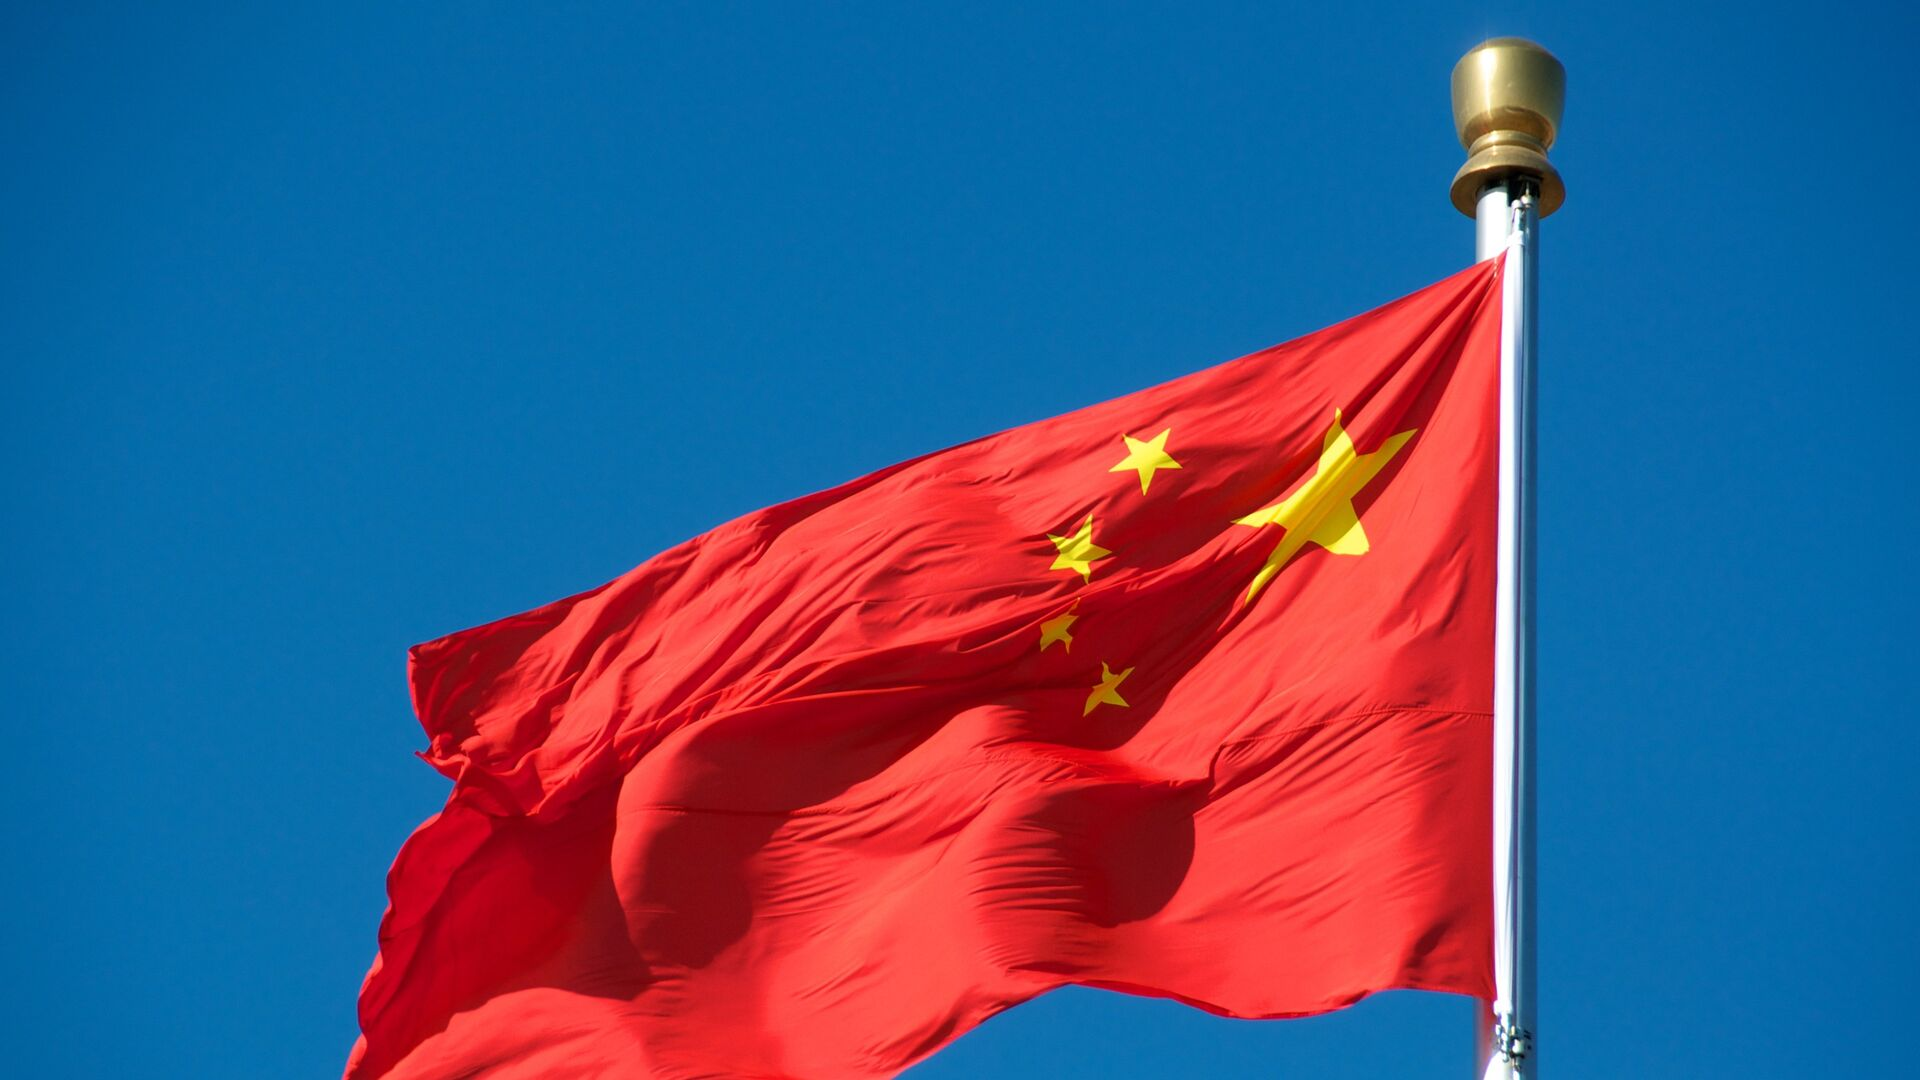 La bandera de China - Sputnik Mundo, 1920, 22.03.2021